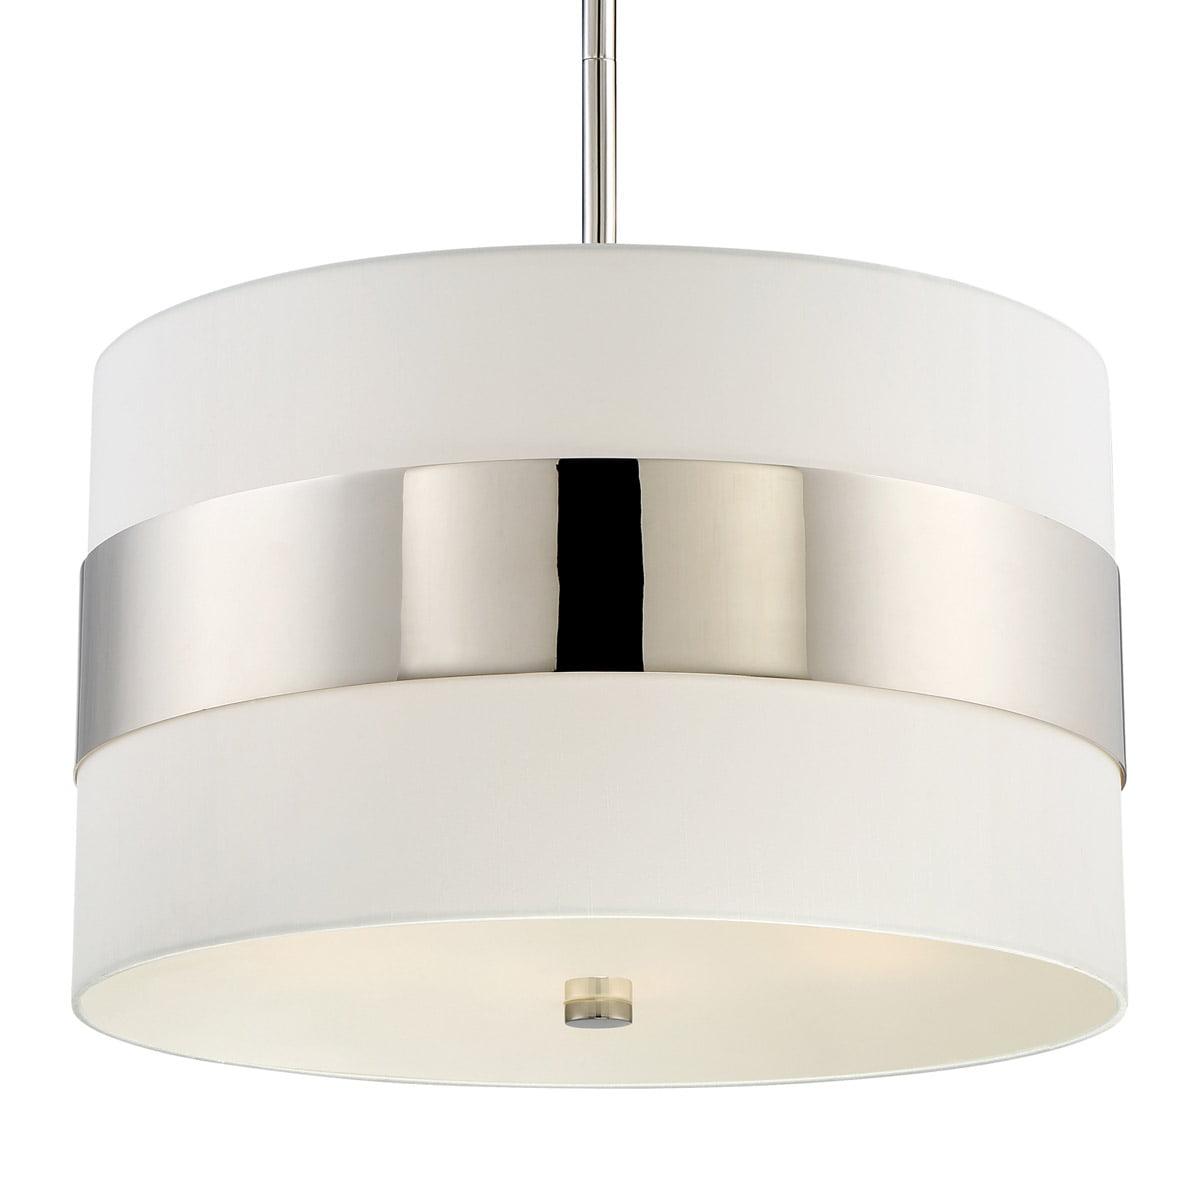 Crystorama 297-PN Grayson 5 Light 23 inch Polished Nickel Pendant Ceiling Light in Polished Nickel (PN) White Silk by Crystorama